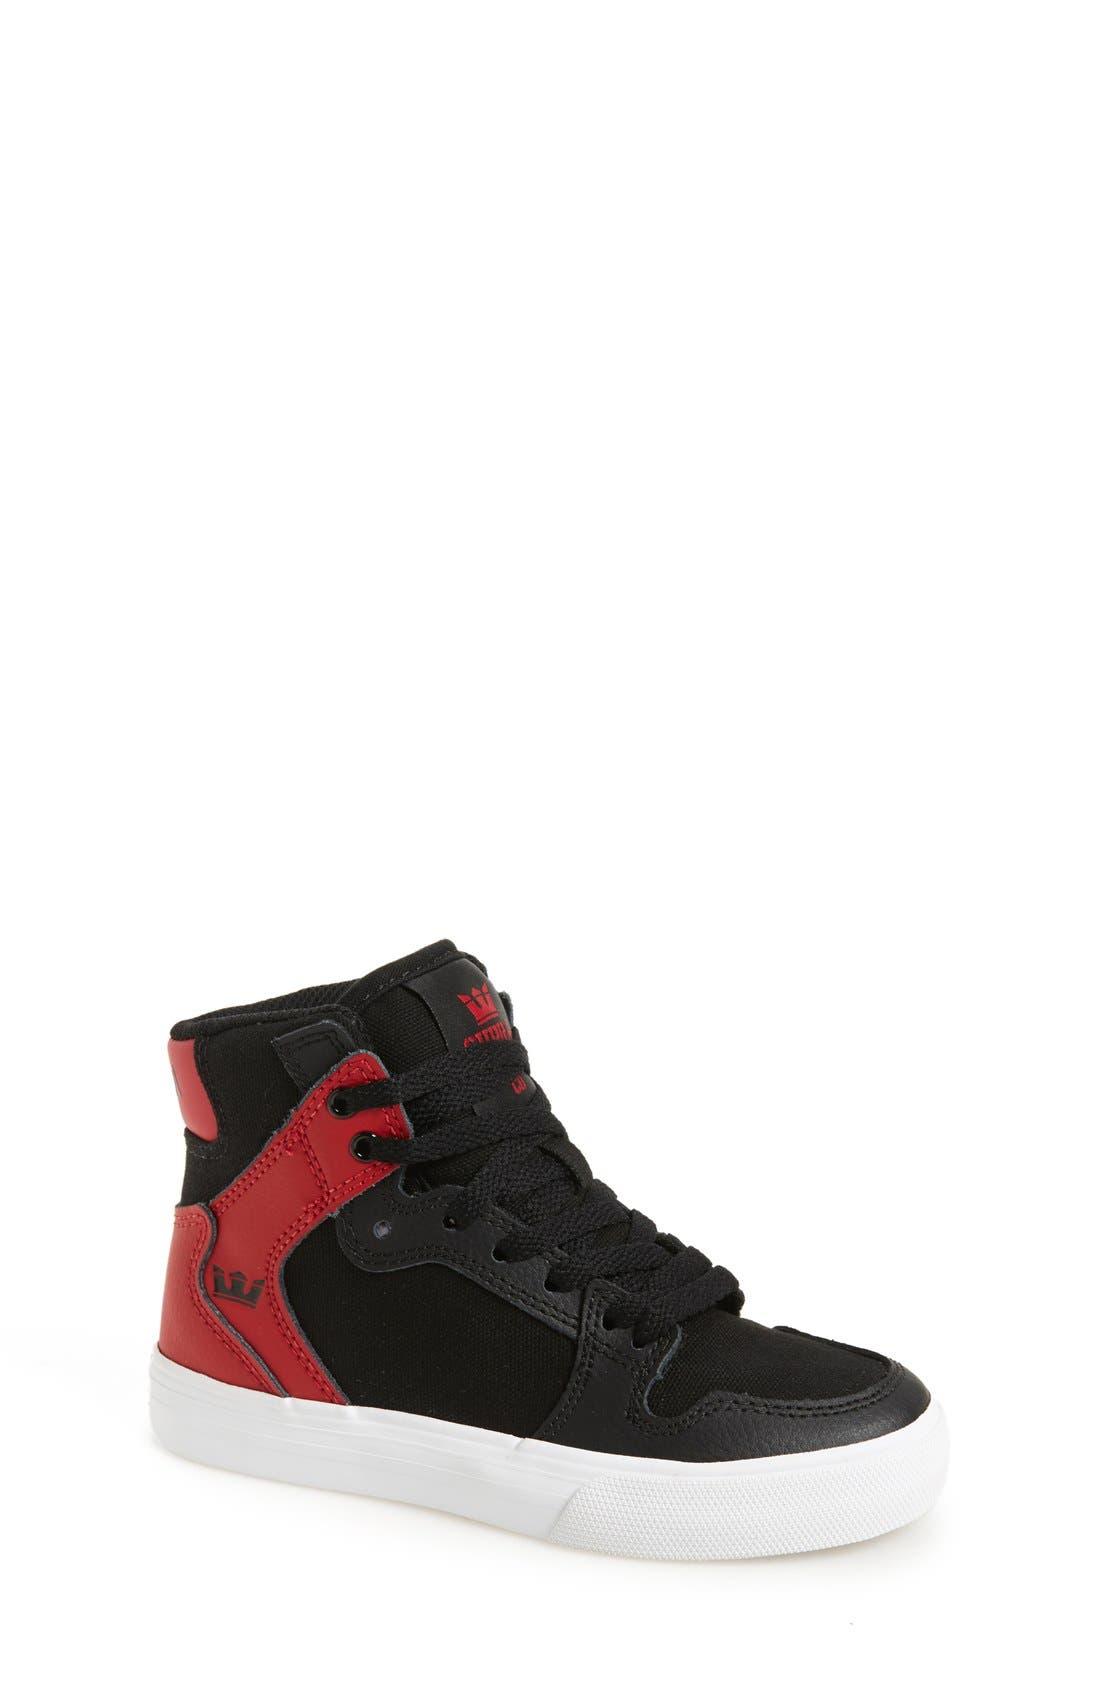 'Vaider' High Top Sneaker,                             Main thumbnail 1, color,                             001